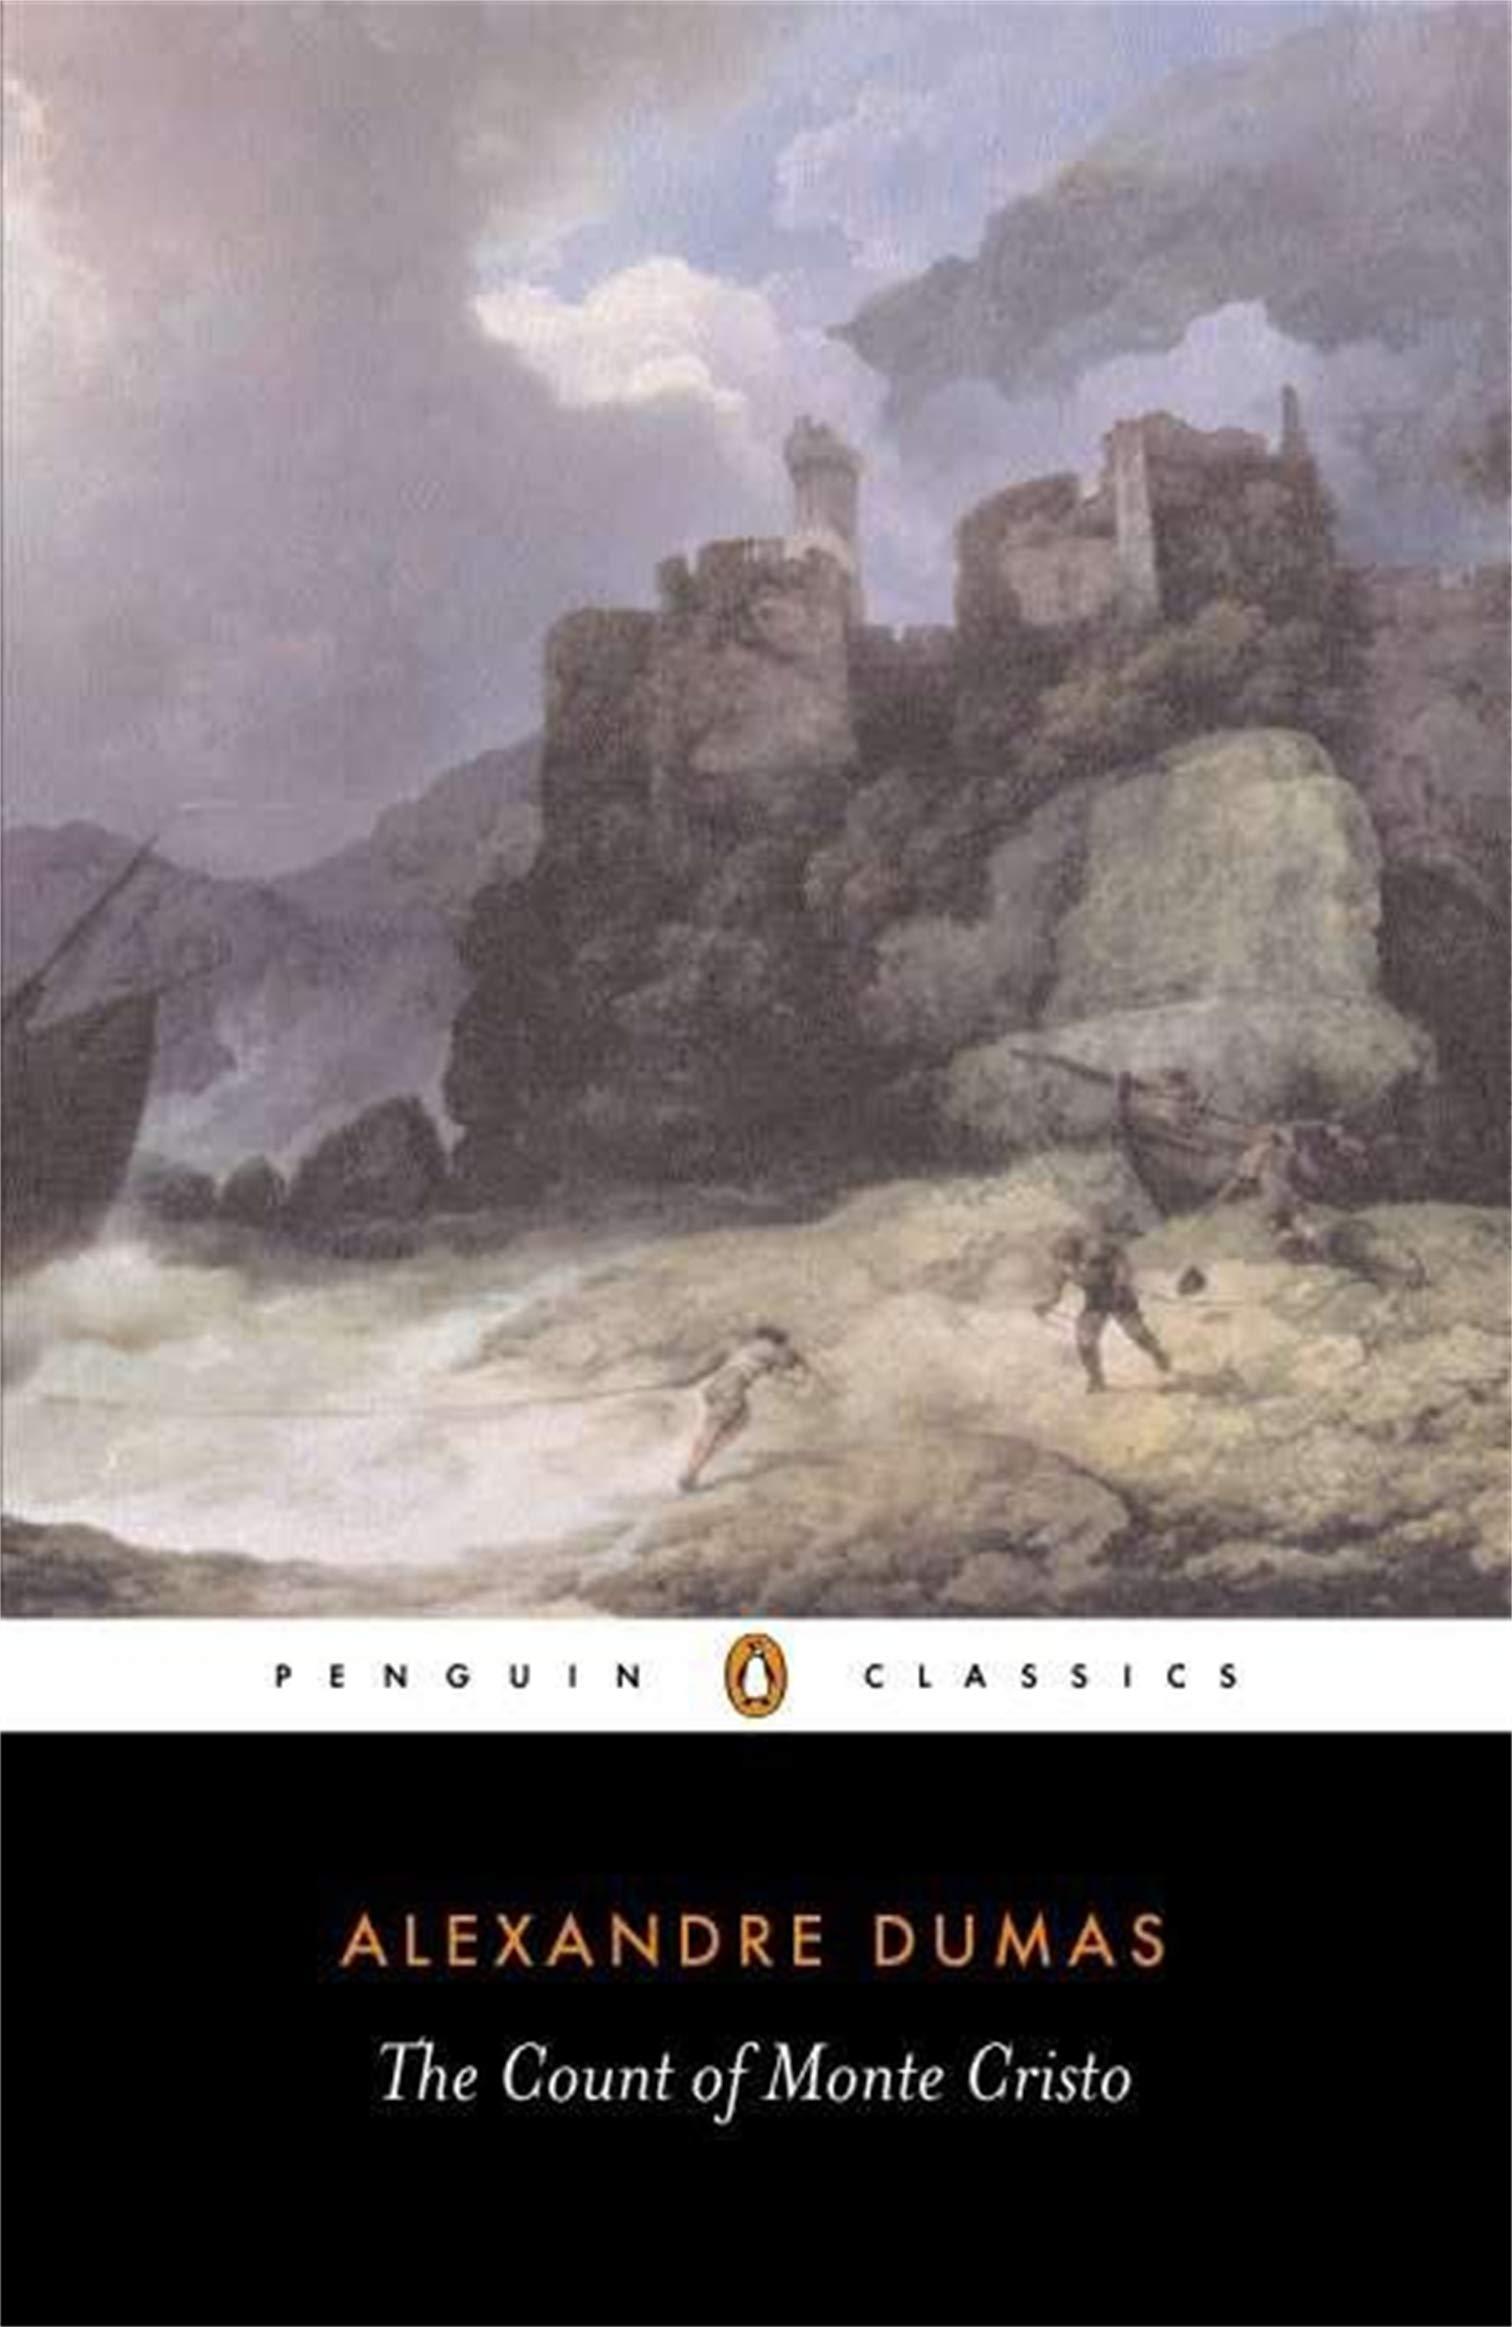 Amazon.com: The Count of Monte Cristo (Penguin Classics) (9780140449266):  Alexandre Dumas père, Robin Buss: Books